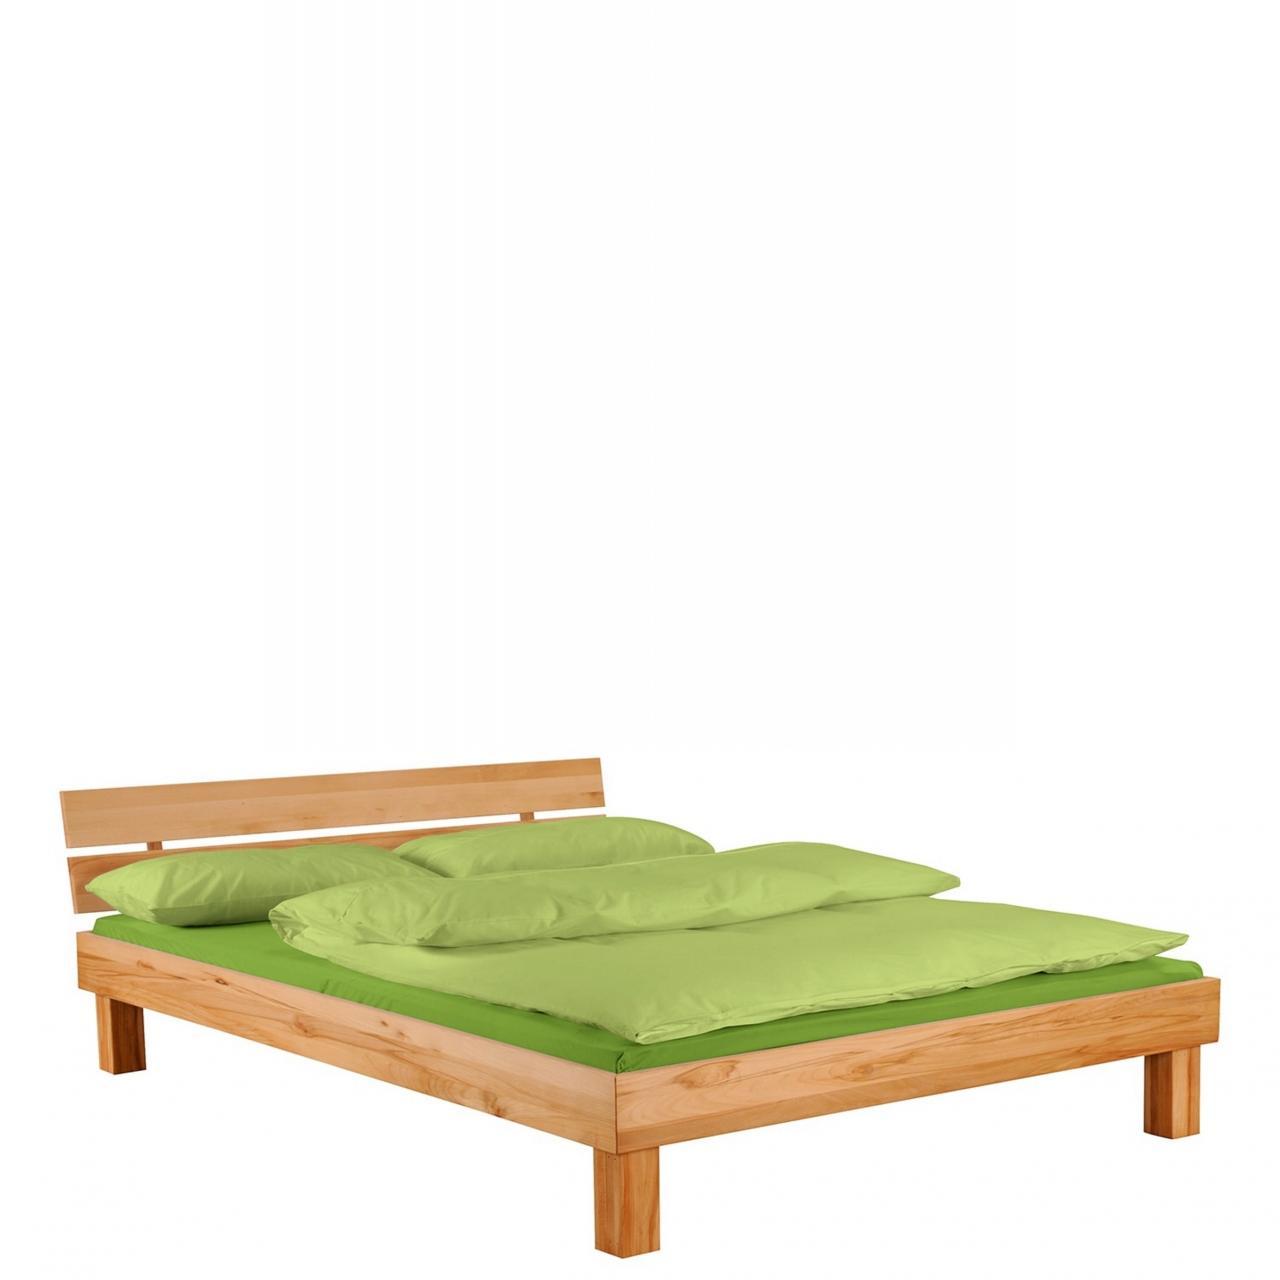 bett campino a 180x200 cm eiche massiv m bel j hnichen center gmbh. Black Bedroom Furniture Sets. Home Design Ideas